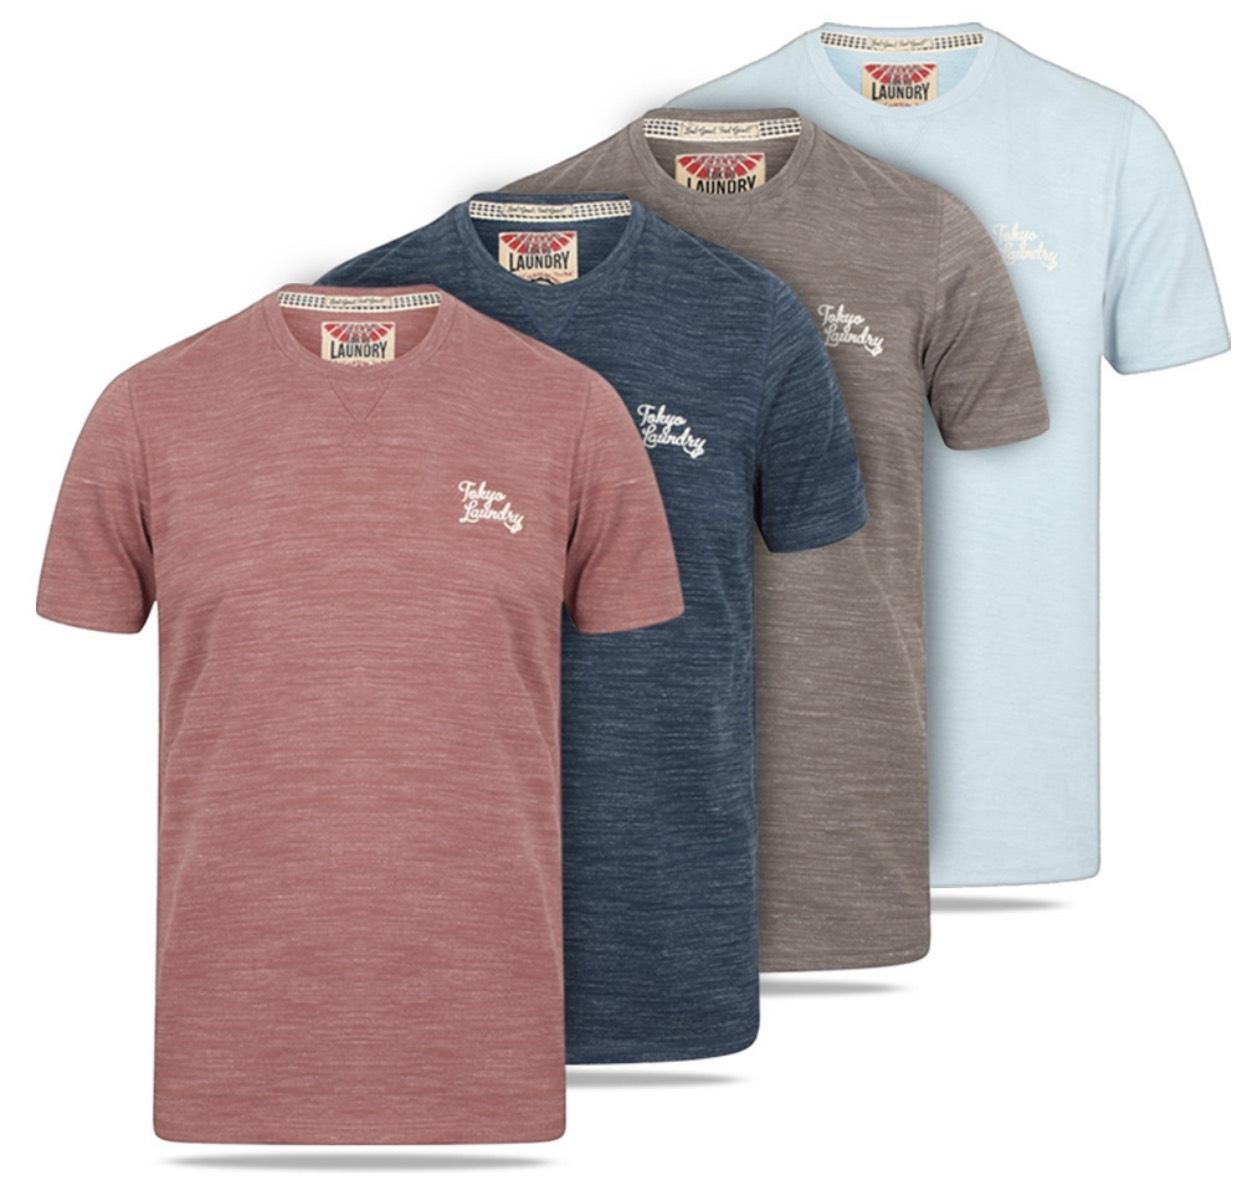 Tokyo Laundry Sun Lake Crew Neck Herren T-Shirt in 4 verschiedenen Farben